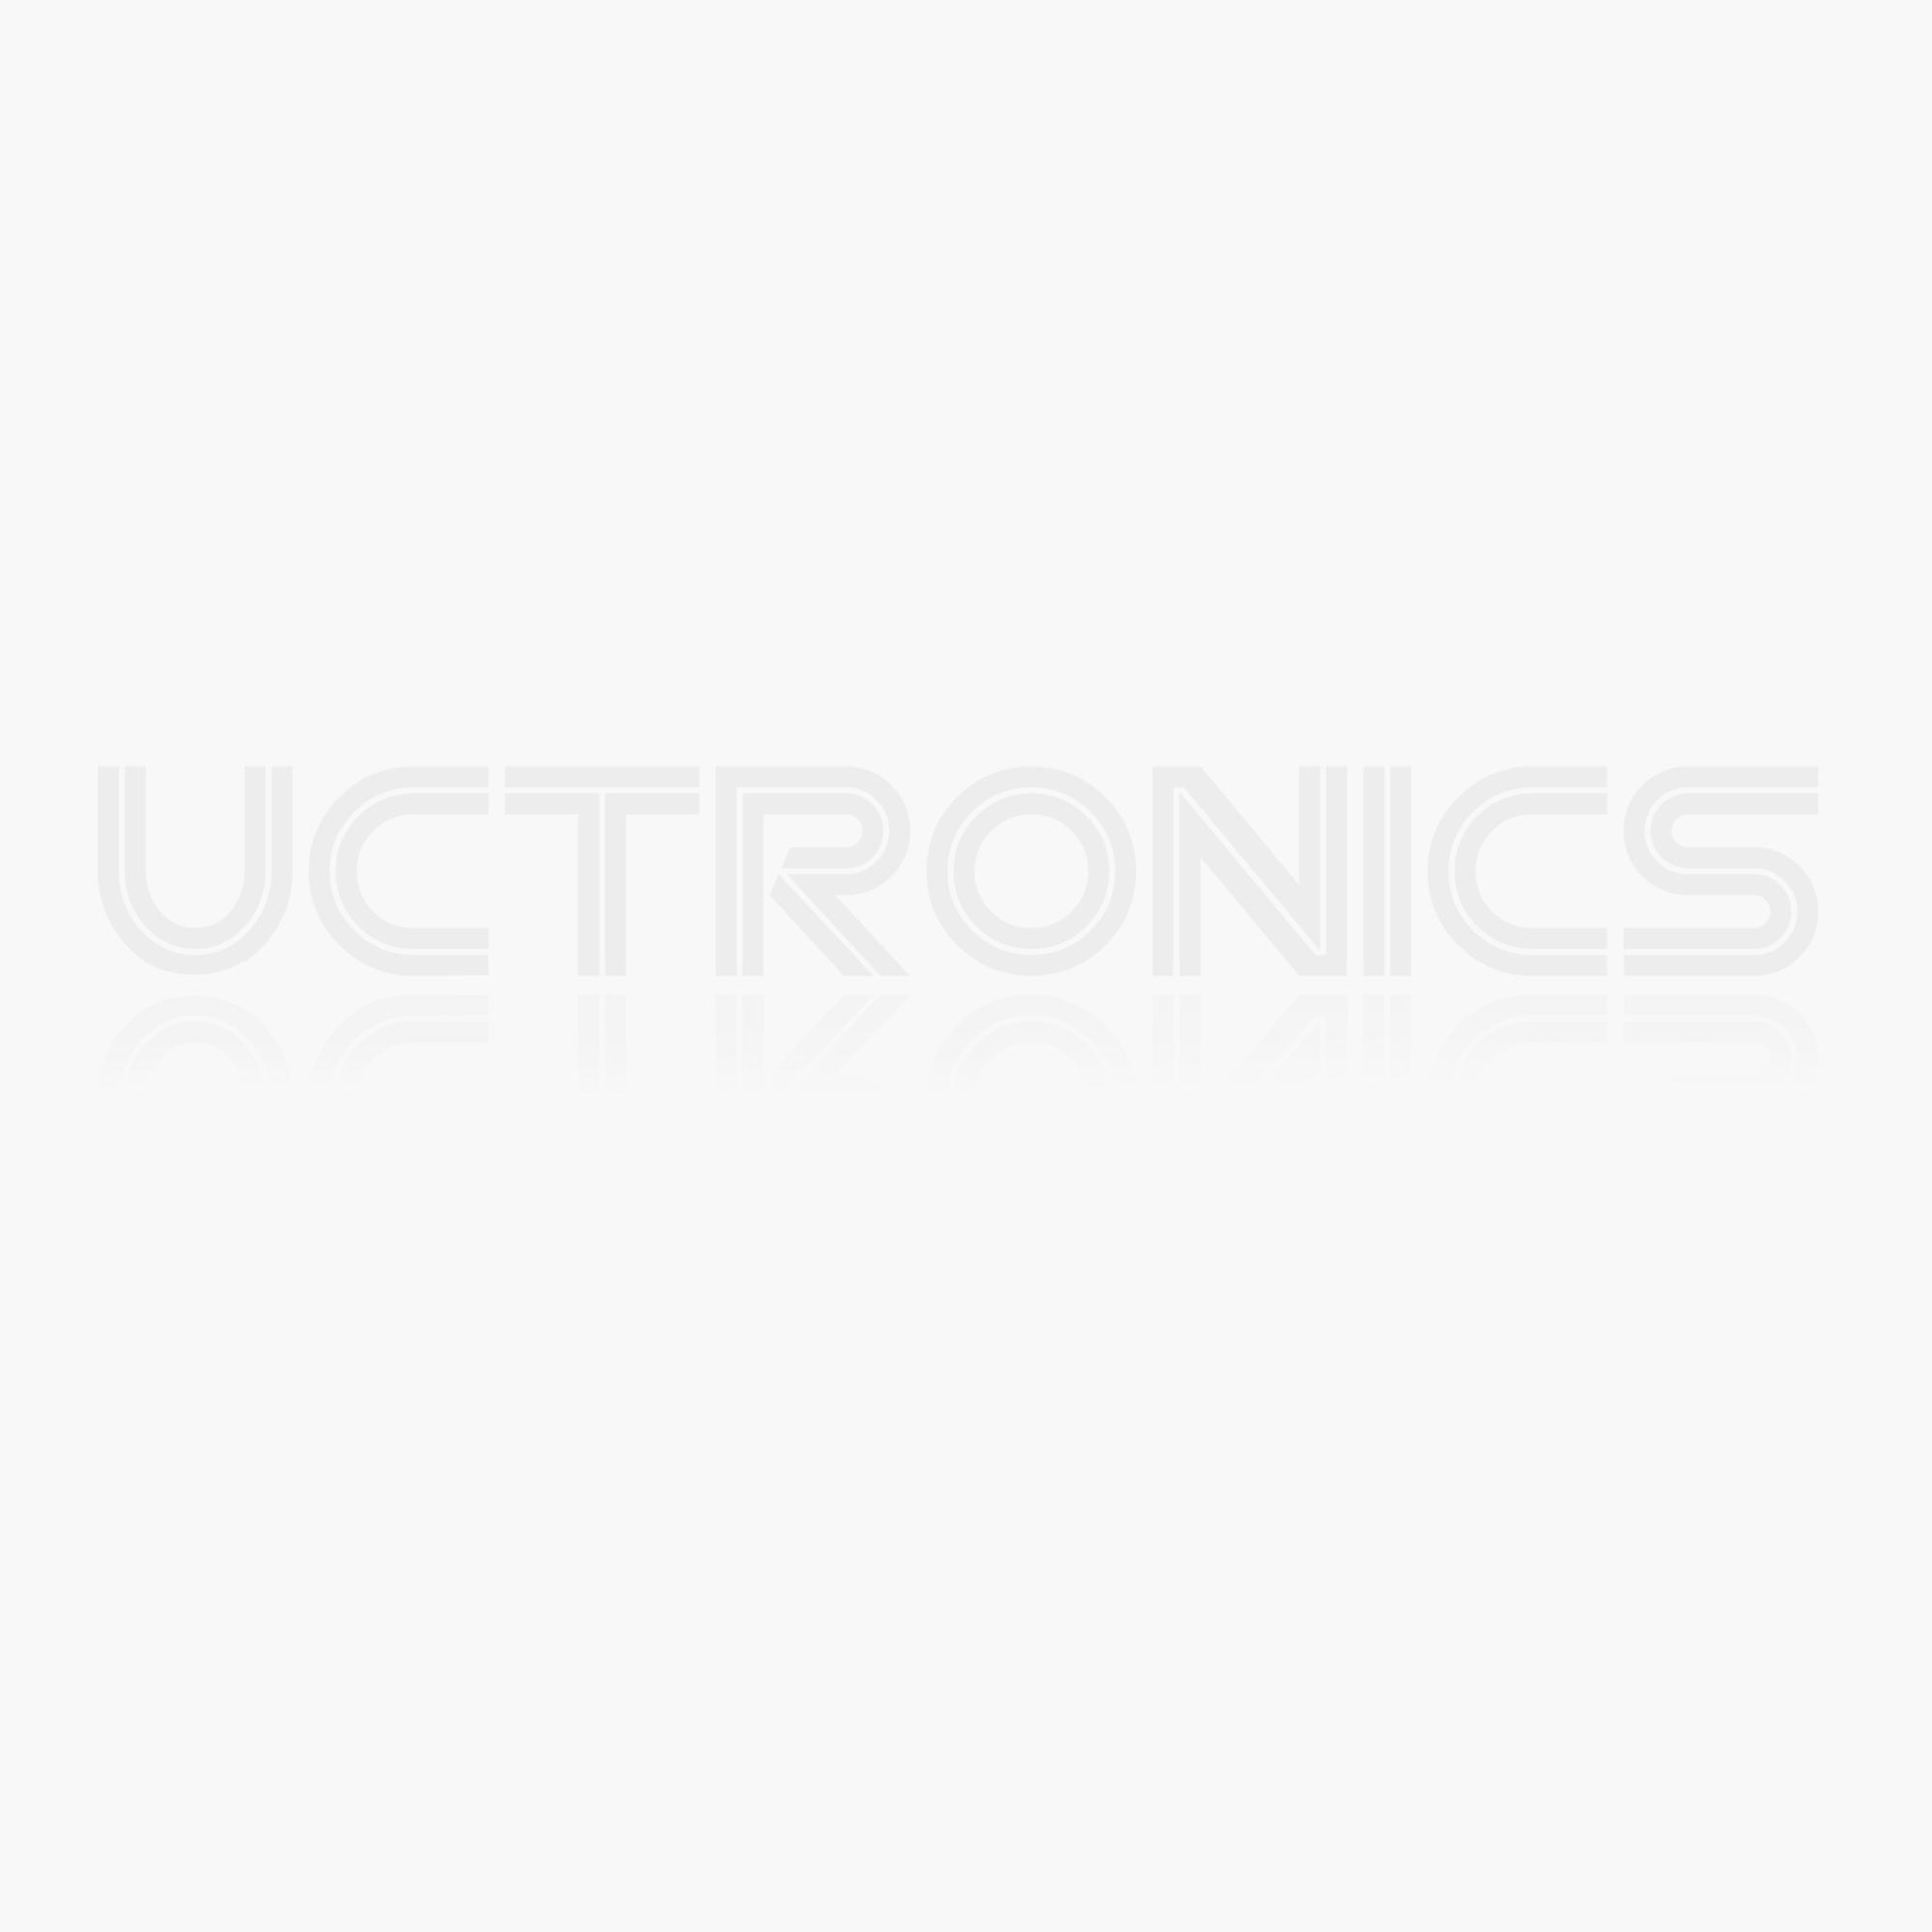 100pcs TO-220 Aluminum Heat Sink 15x10x20mm for Transistors